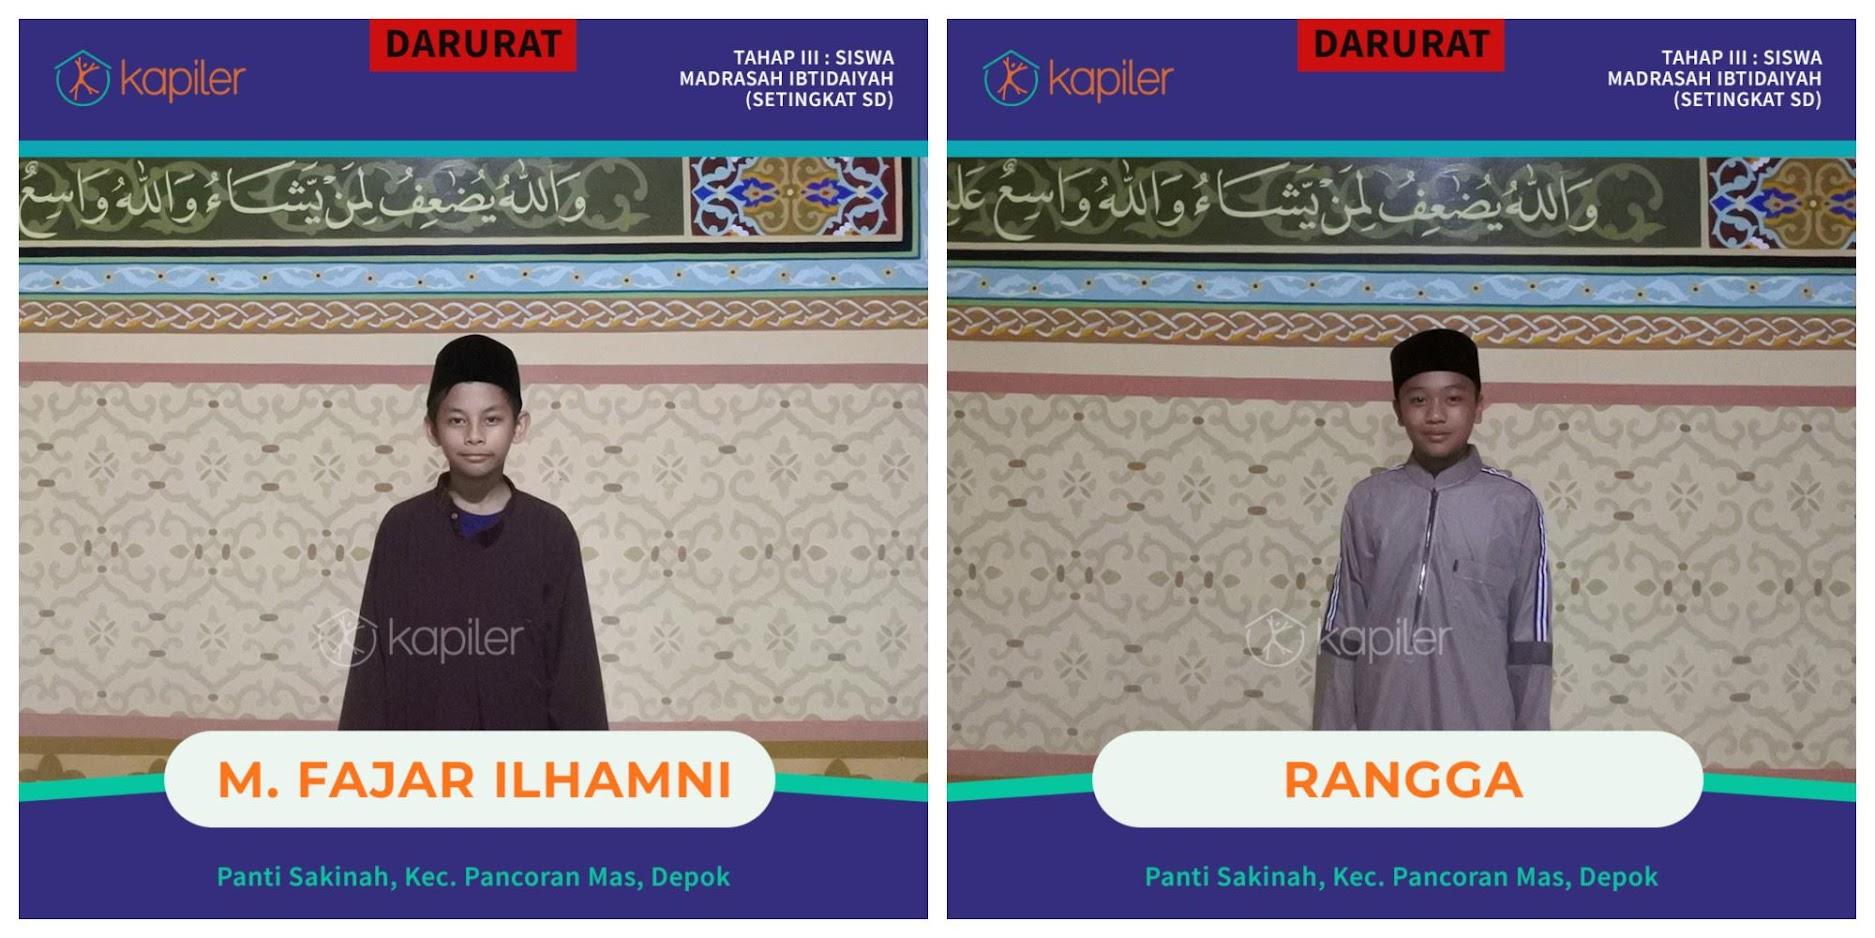 Kapiler Indonesia Donasi Online Anak Panti Asuhan Lembaga Yayasan Berdaya